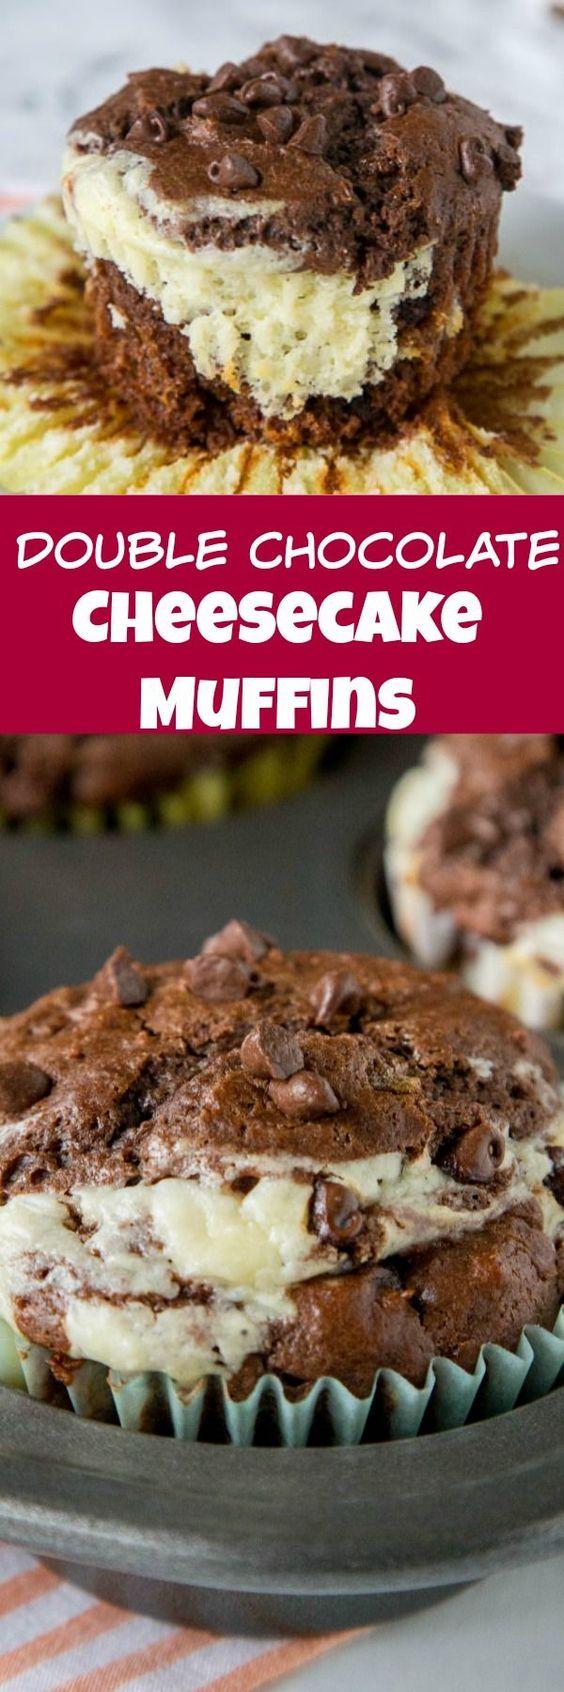 Double-Chocolate-Cheesecake-Muffins